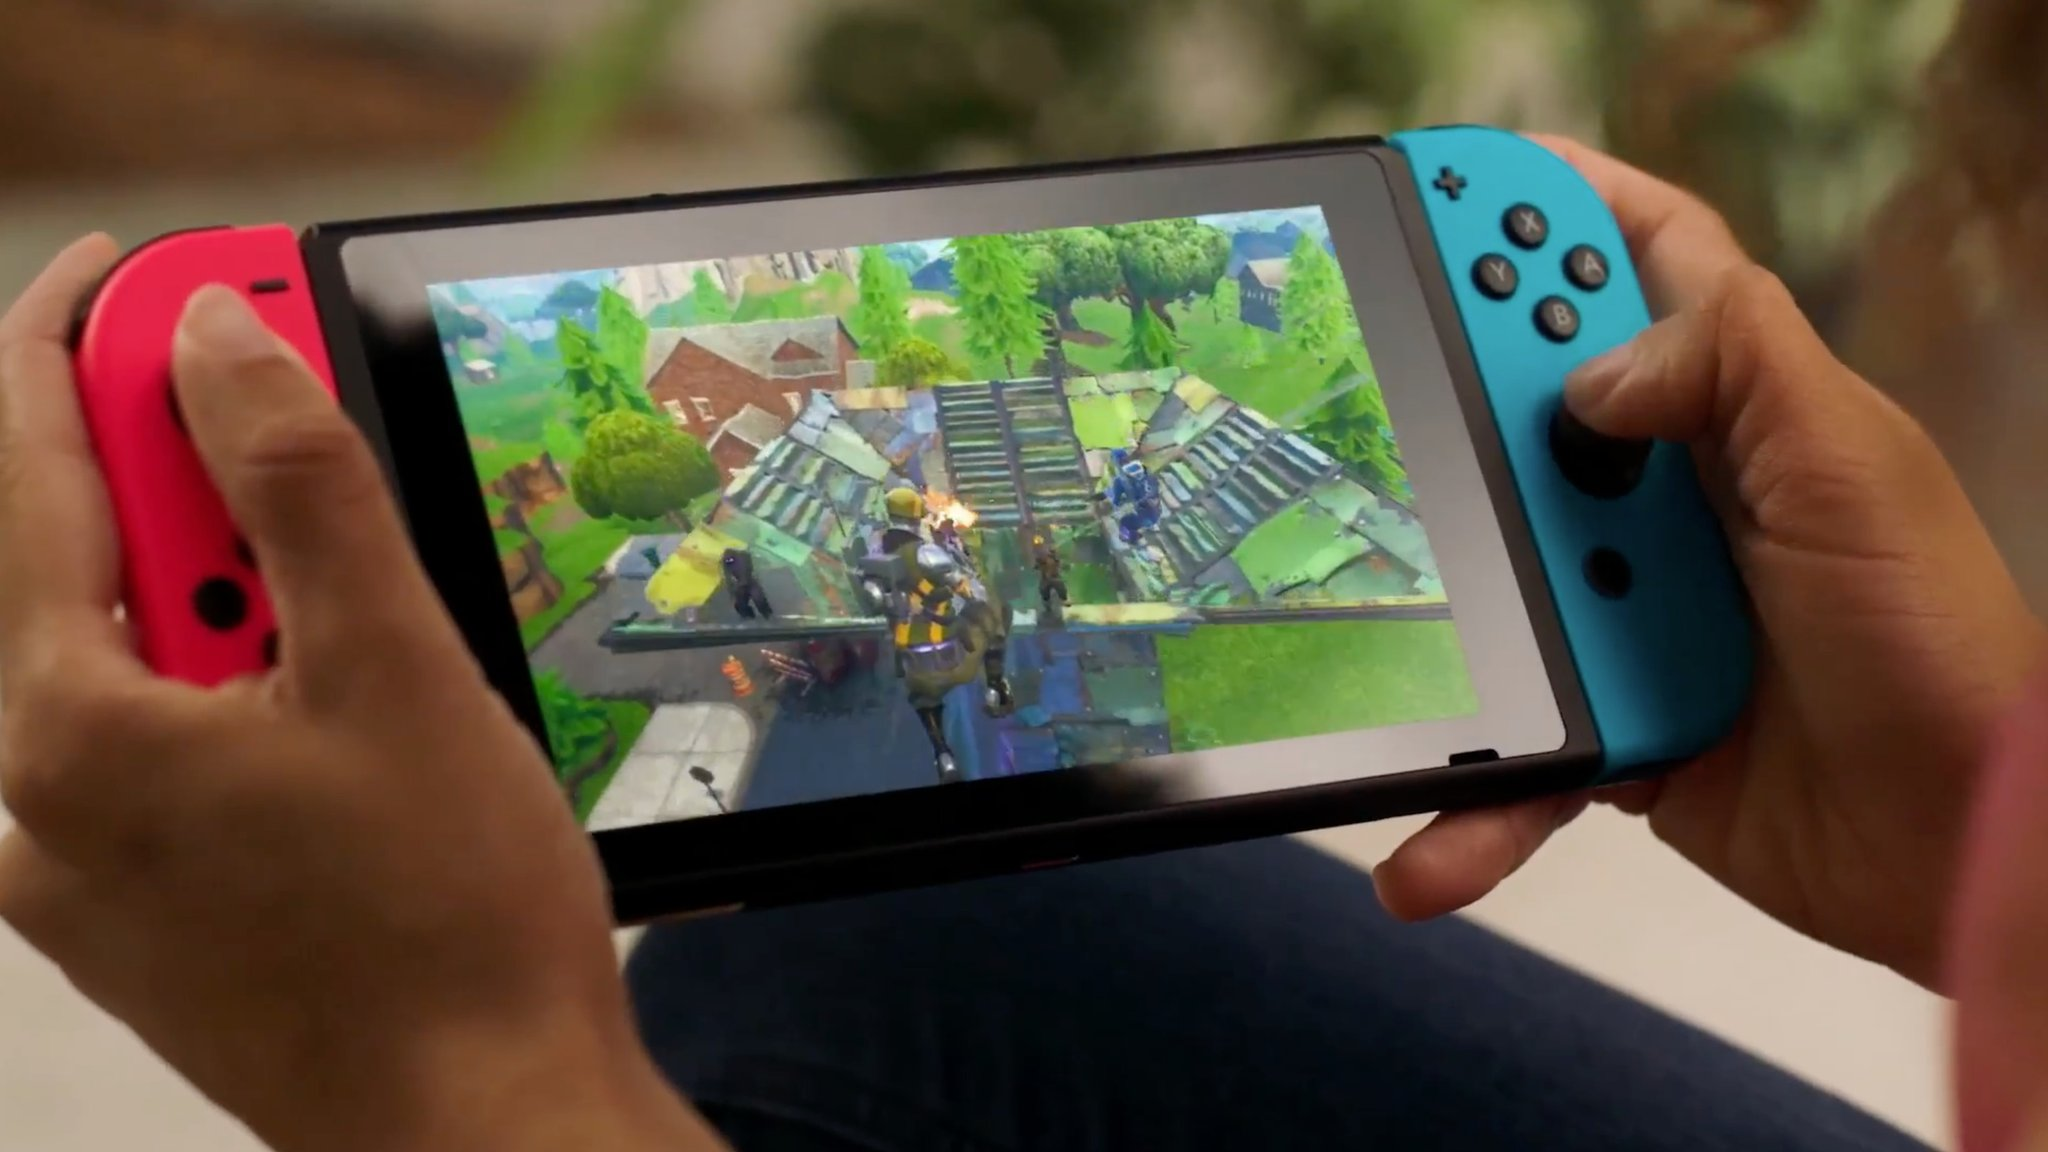 Nintendo Switch gets Fortnite